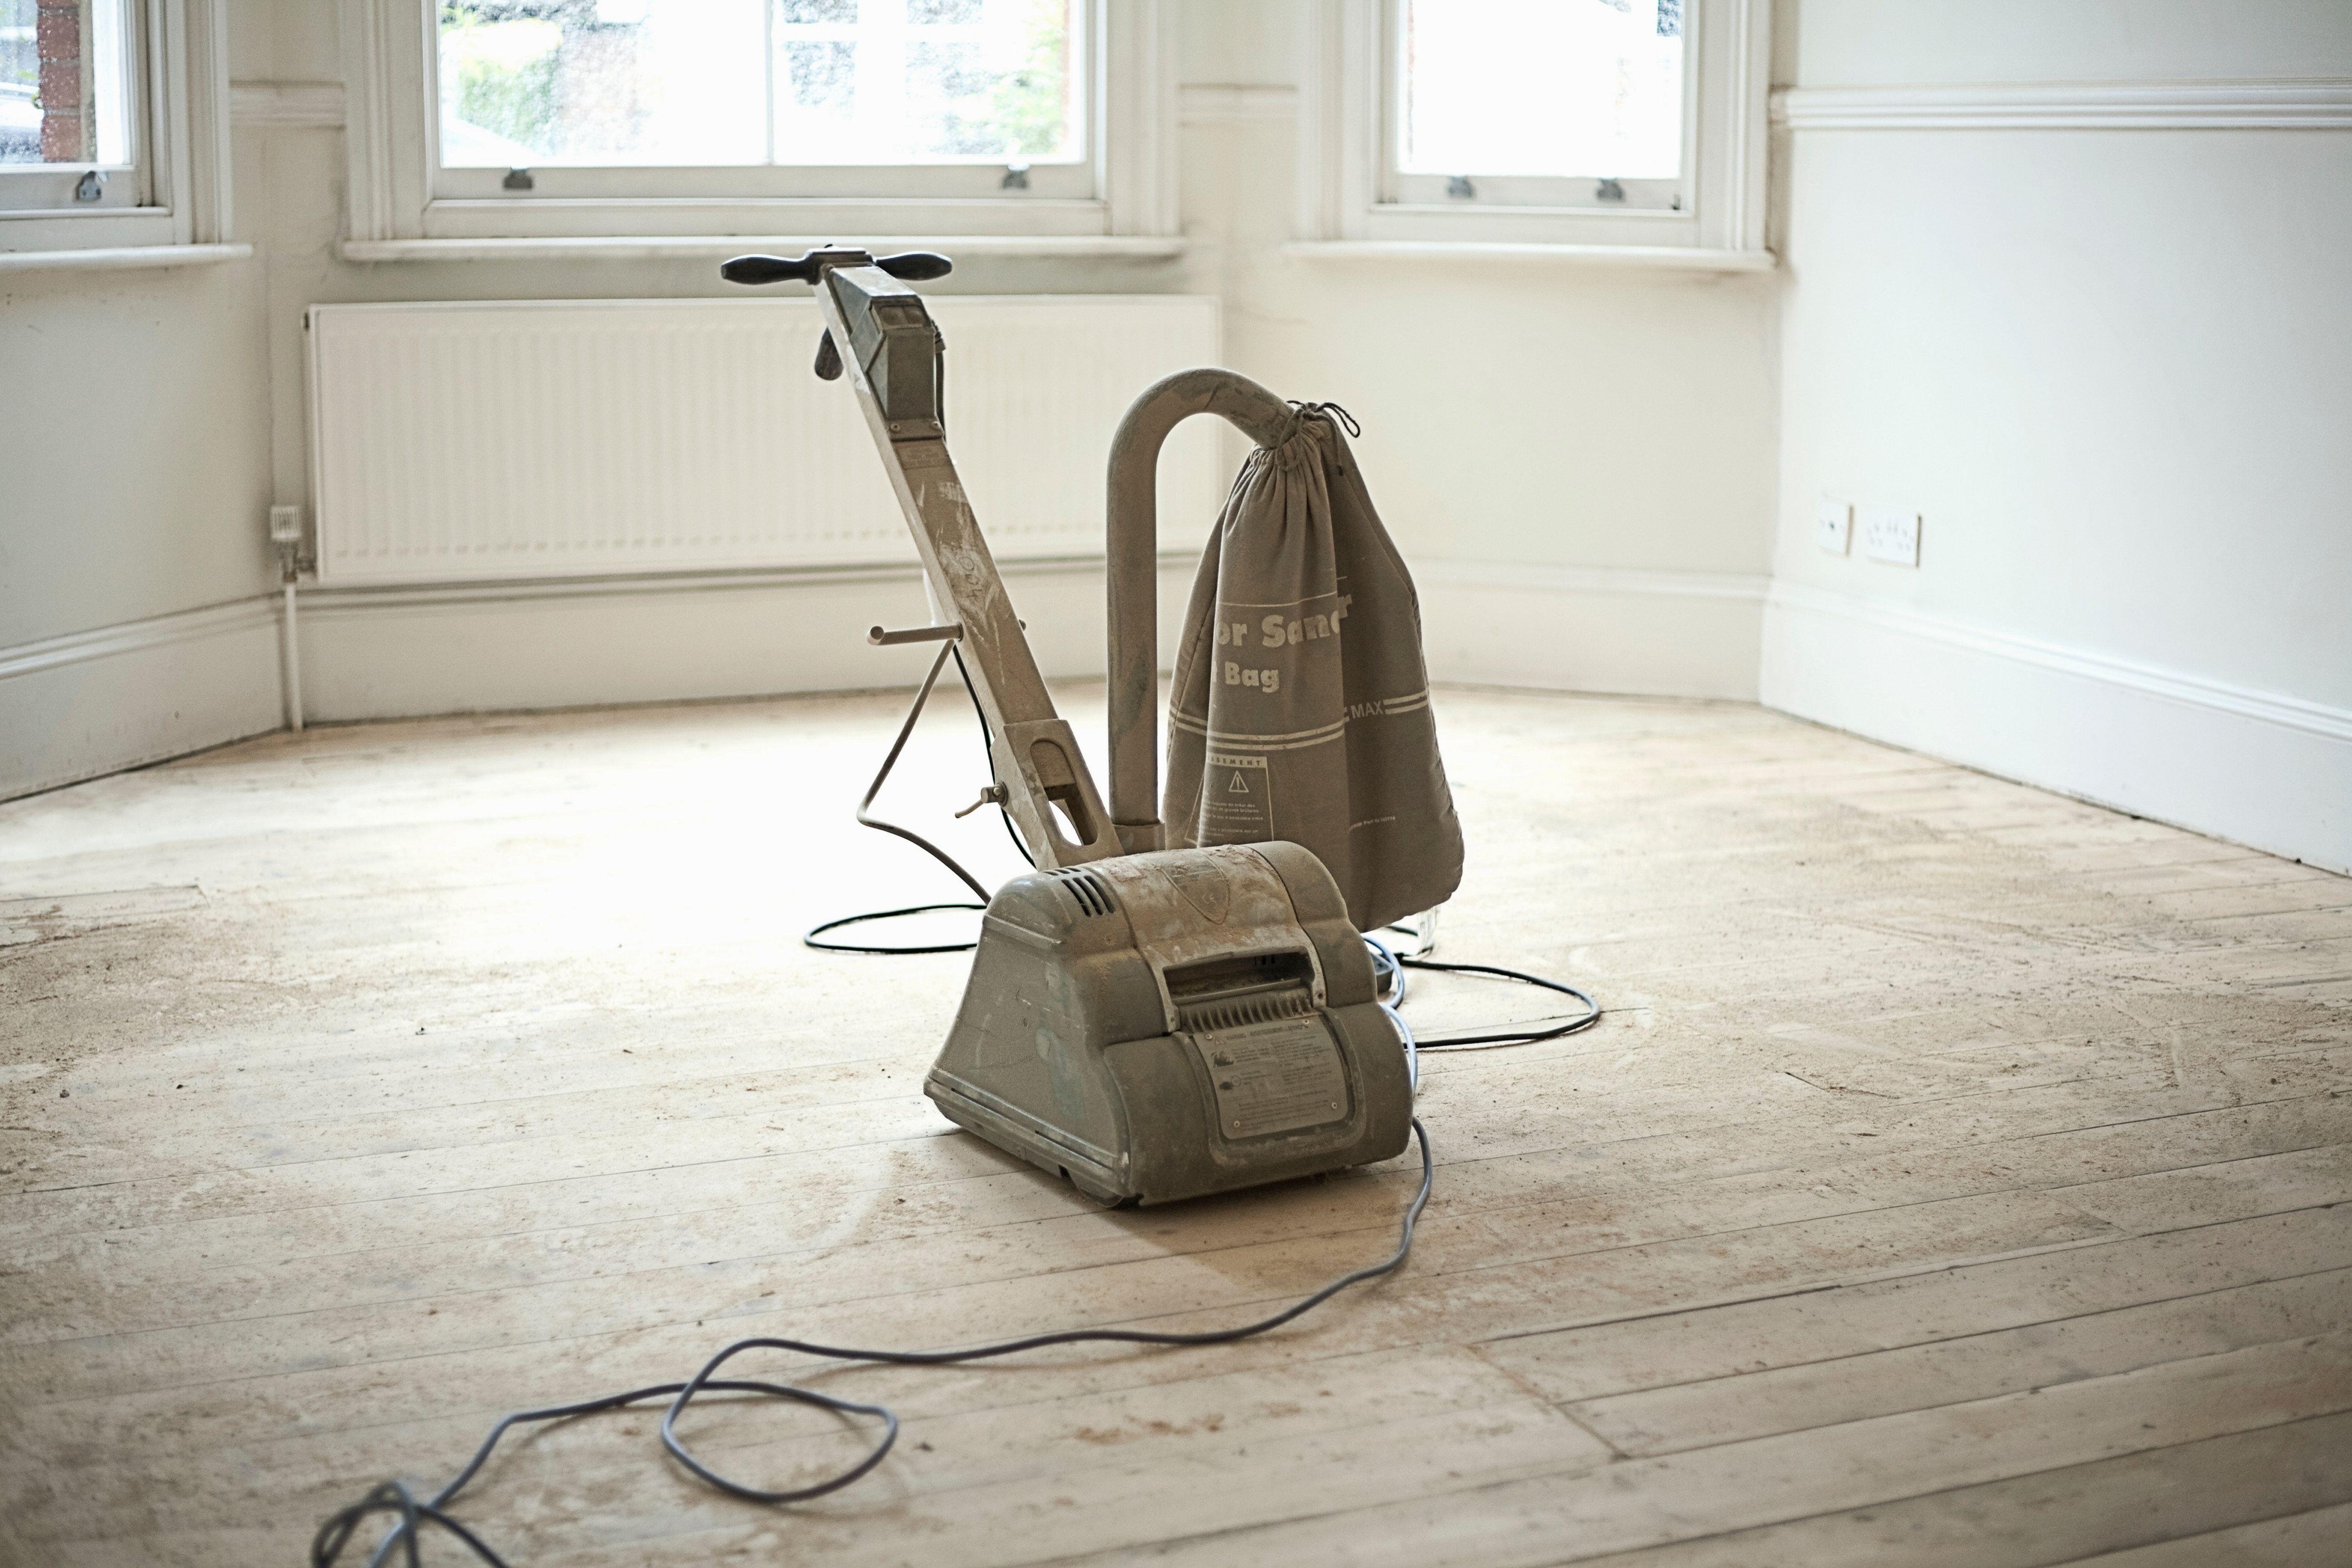 3 Sanders To Rent When Refinishing Wood Floors